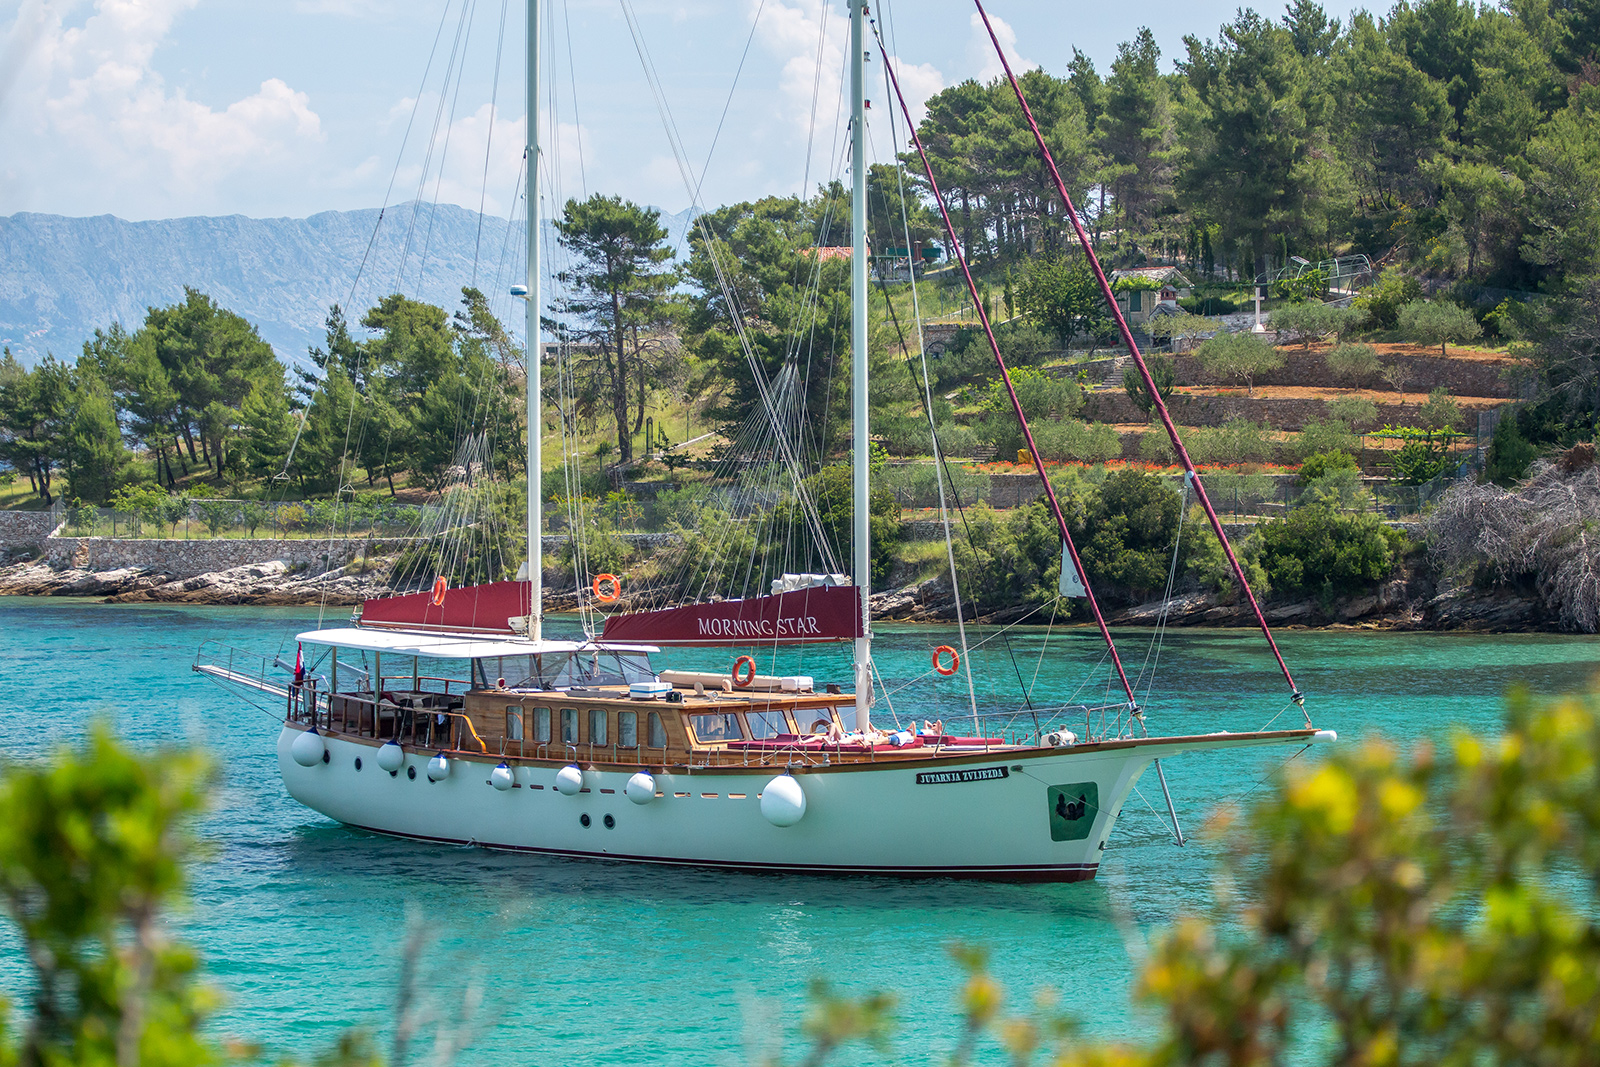 MORNING STAR - Luxury Gulet in Croatia